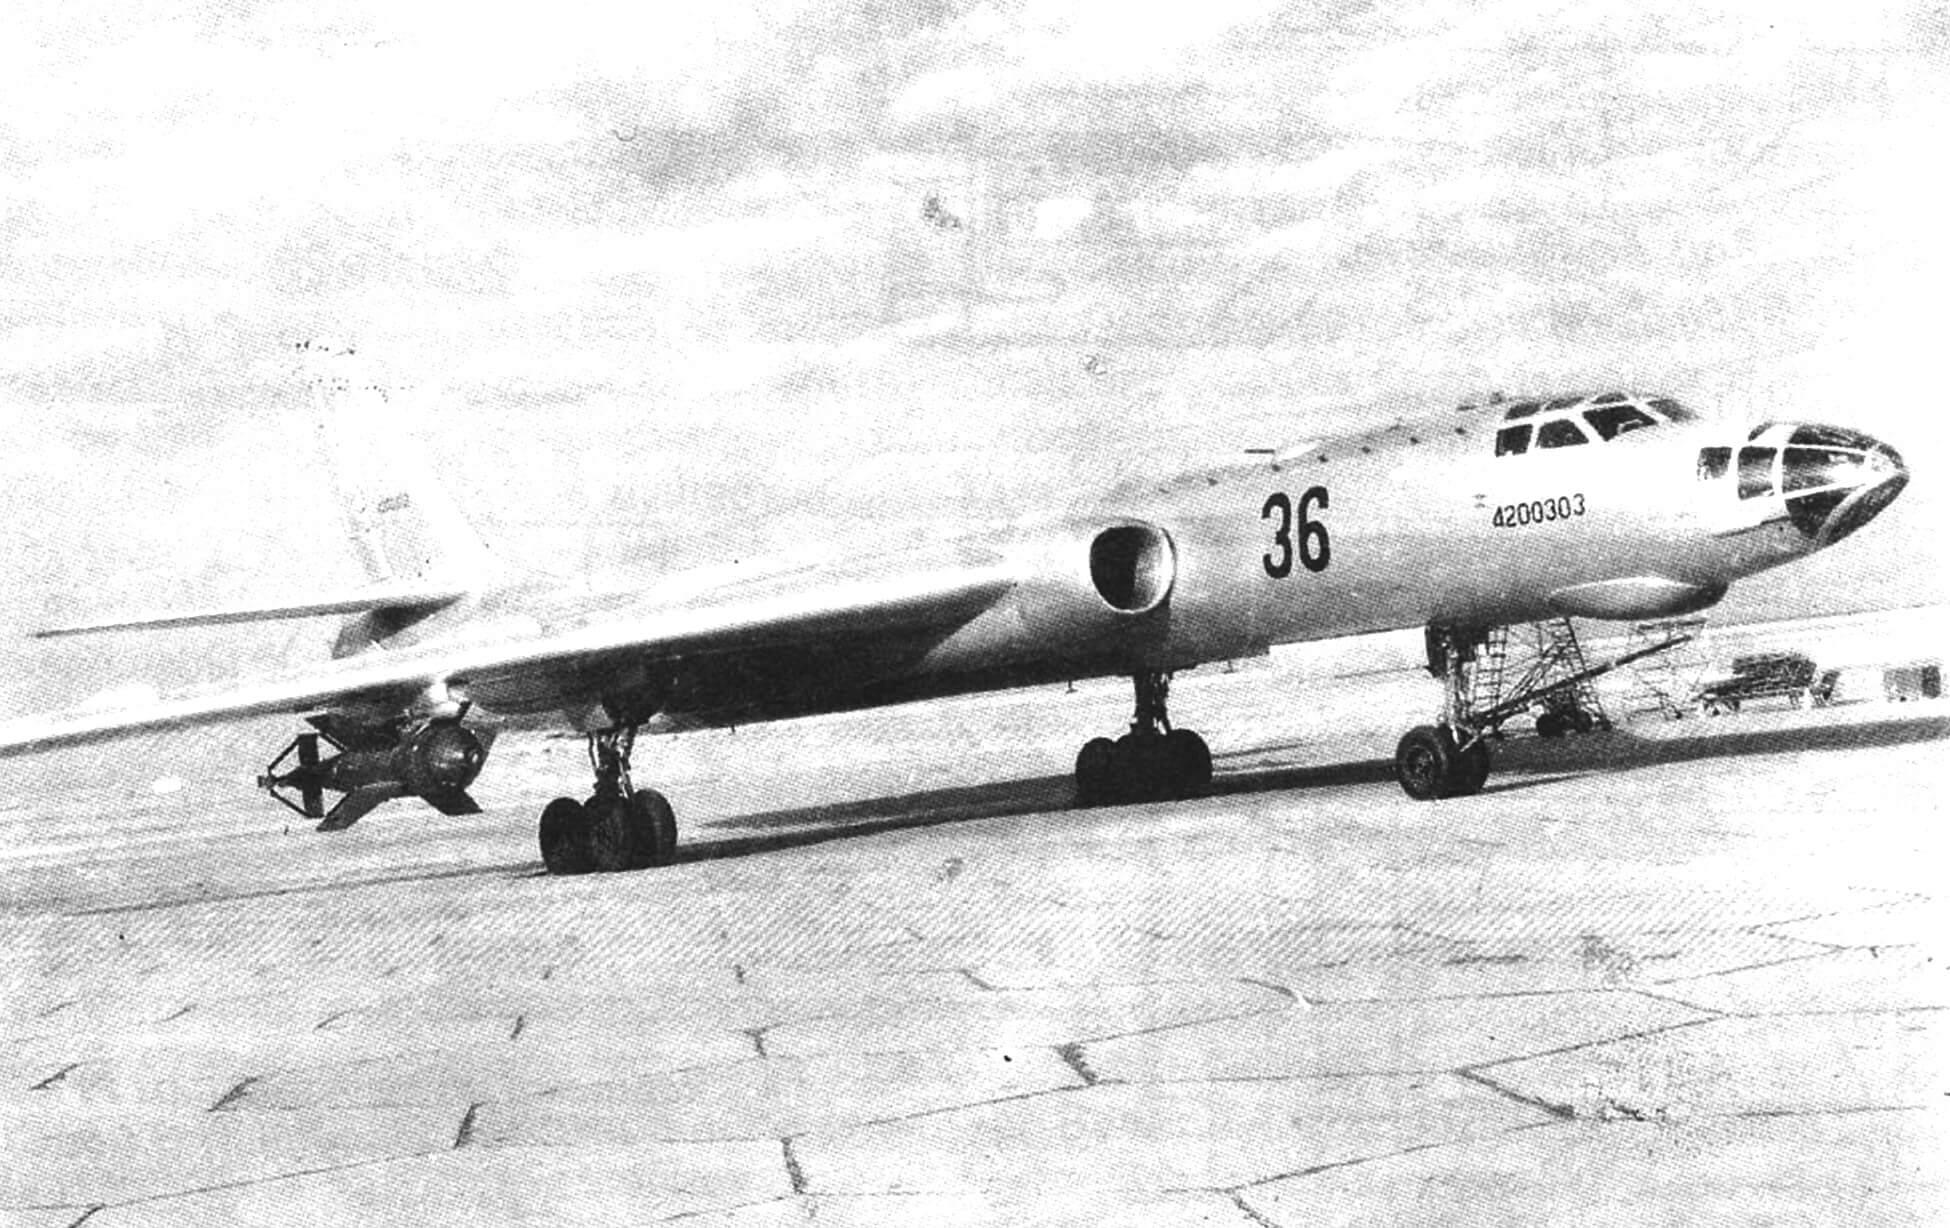 Дальний бомбардировщик Ту-16 с бомбой СНАБ-3000